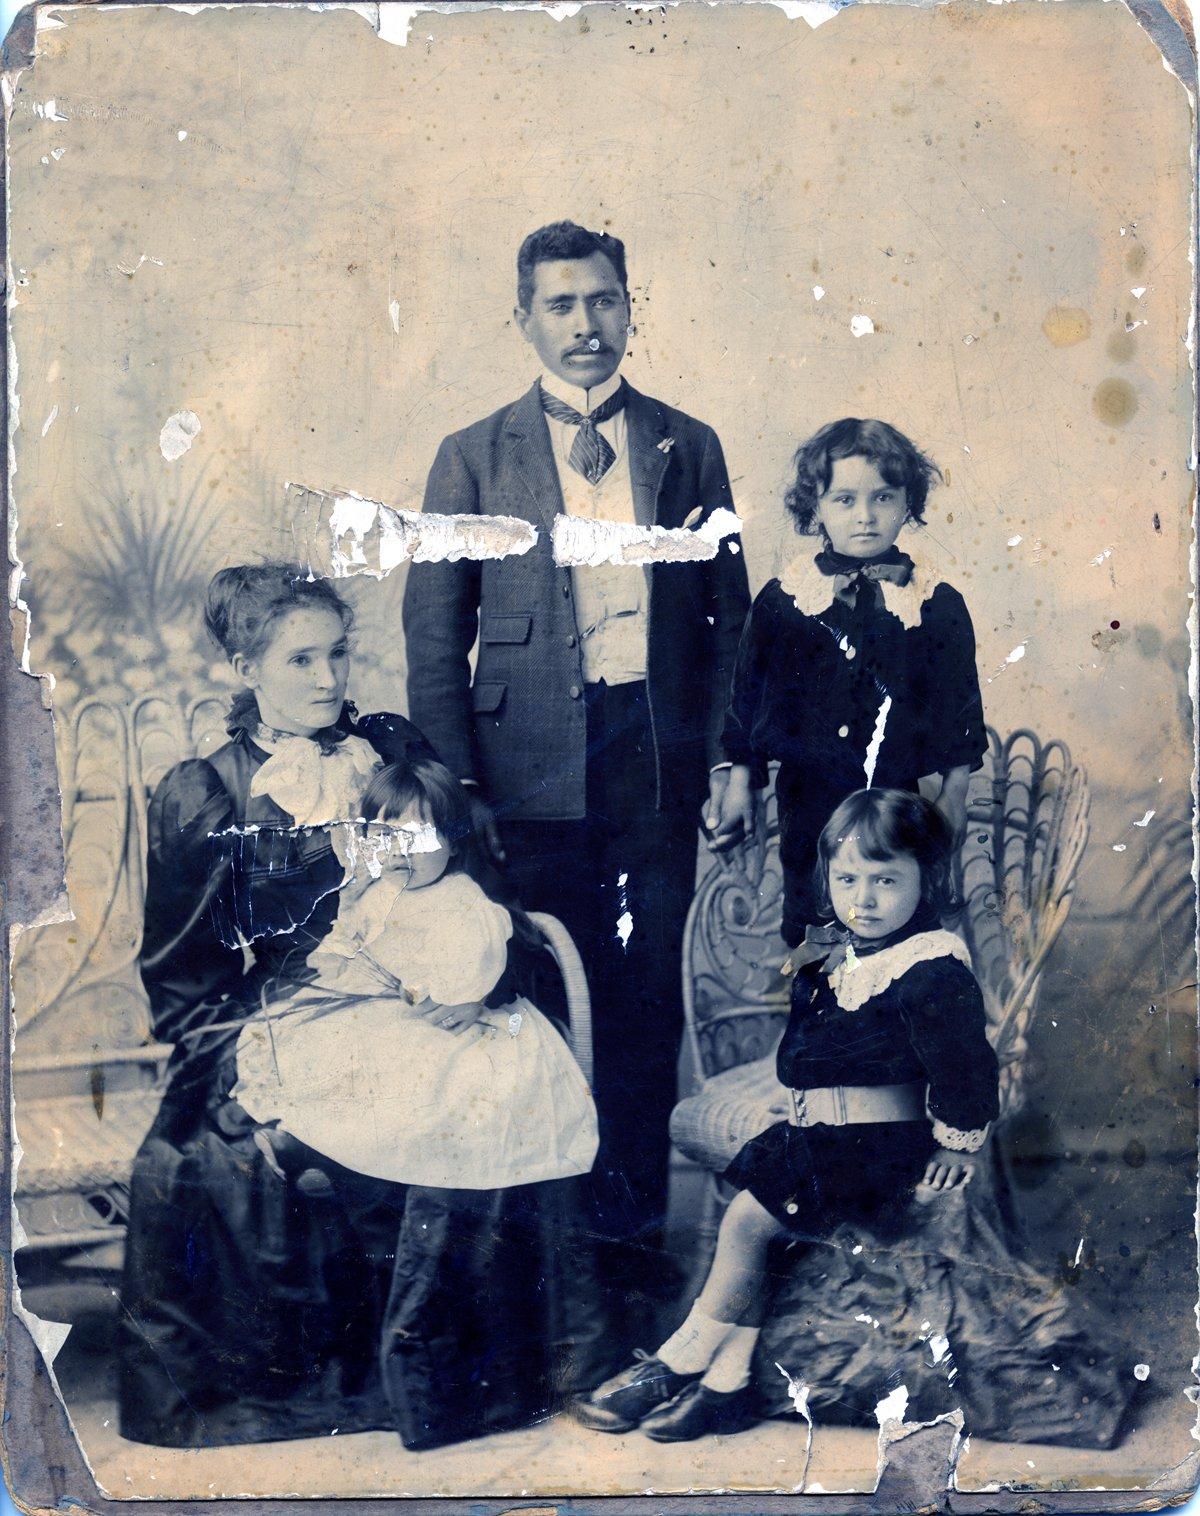 Photo before restoration